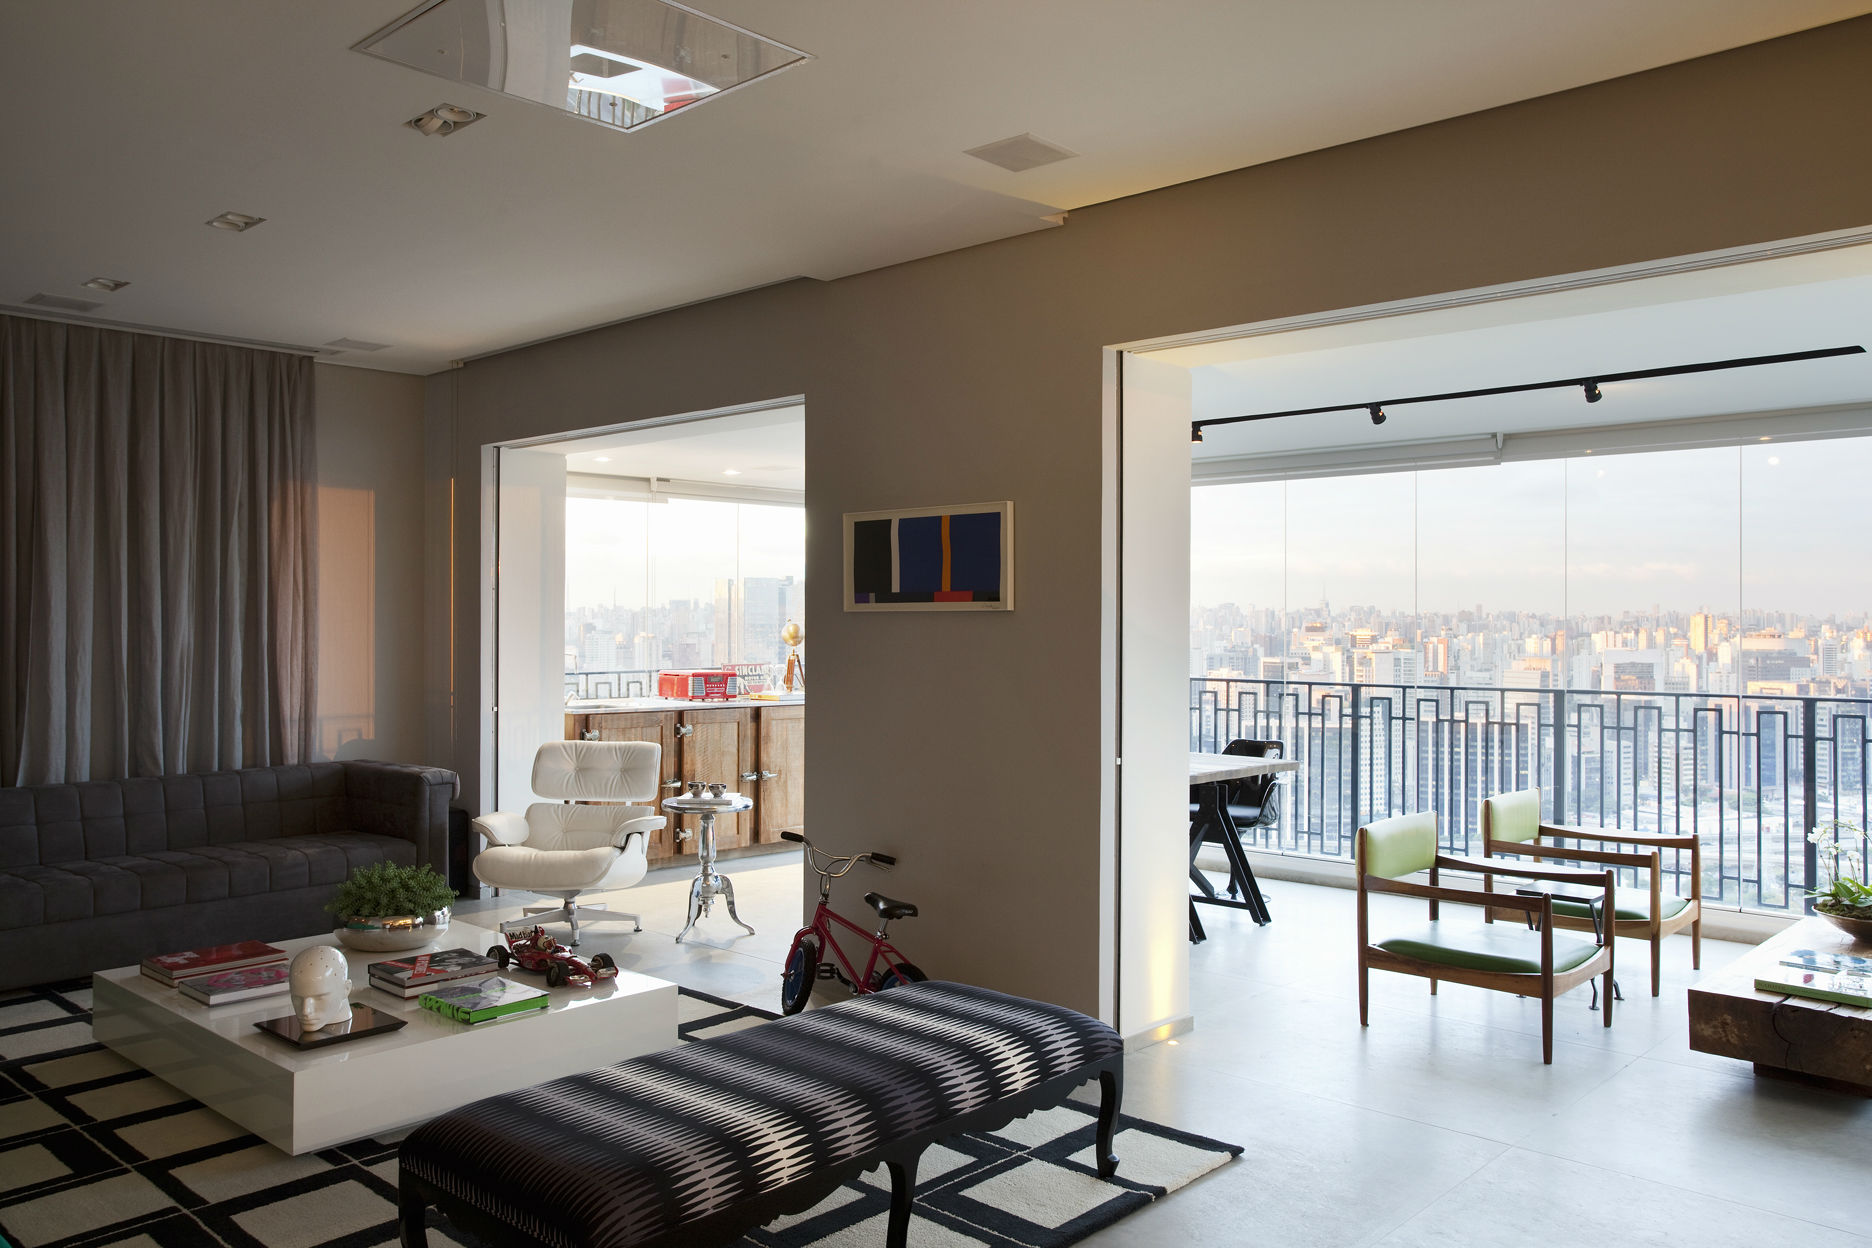 Varanda Integrada Sala O Novo Living Casa Casada